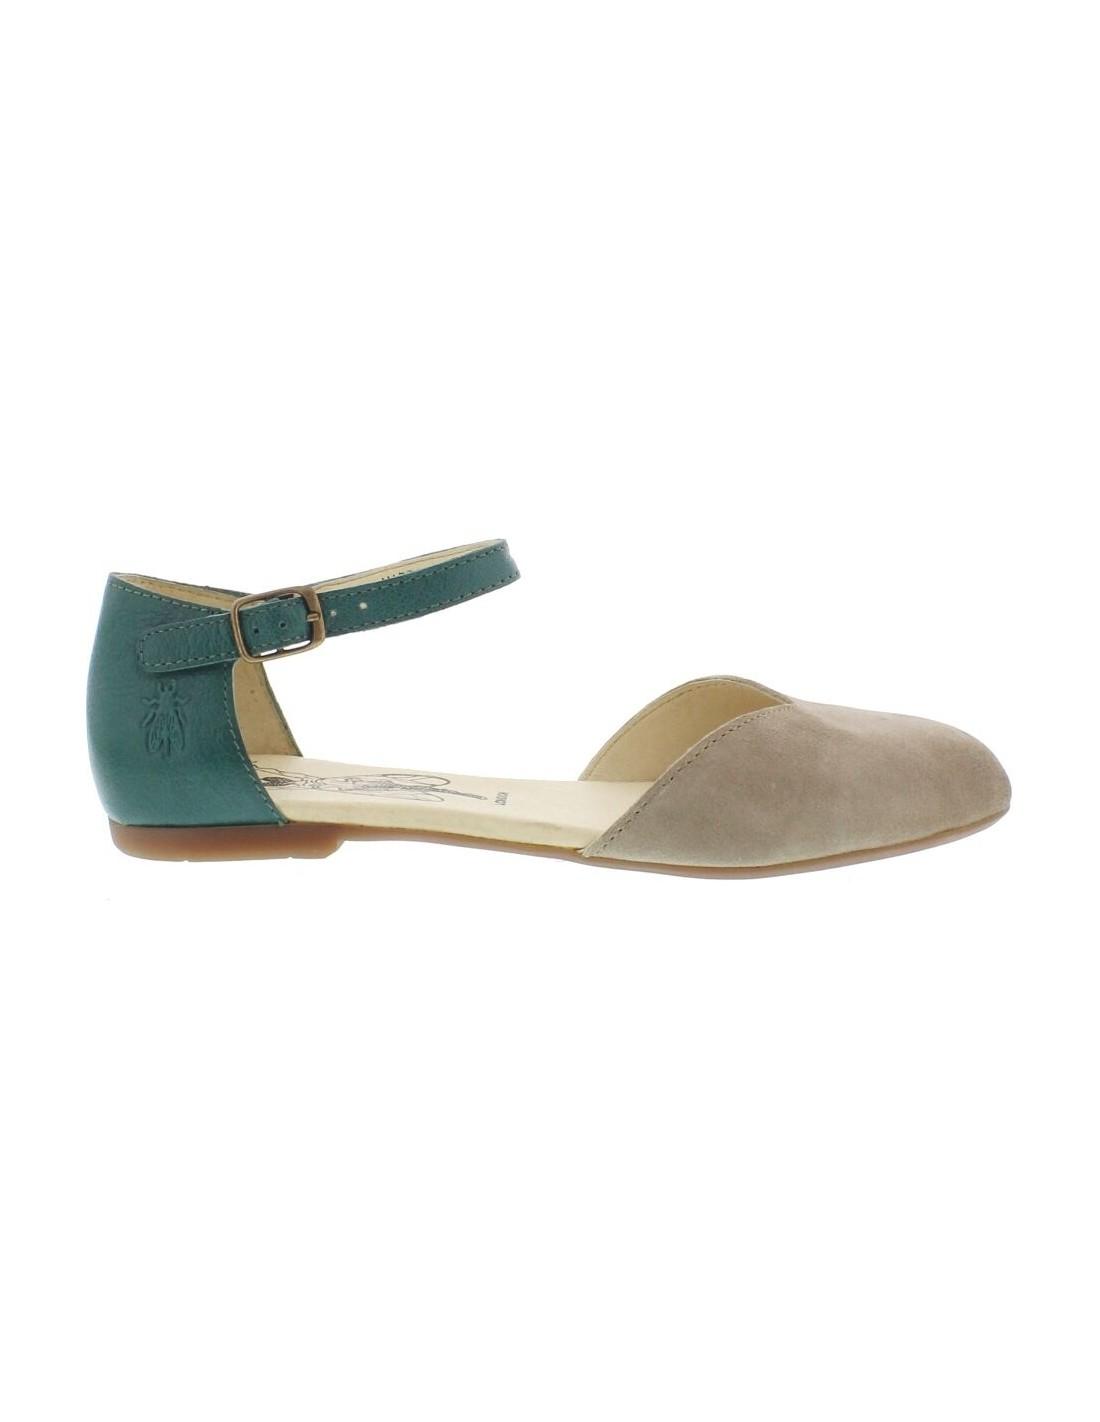 comprar London Sandalia Cuña Mujer Fly Sandalias Zapato wOXqRI